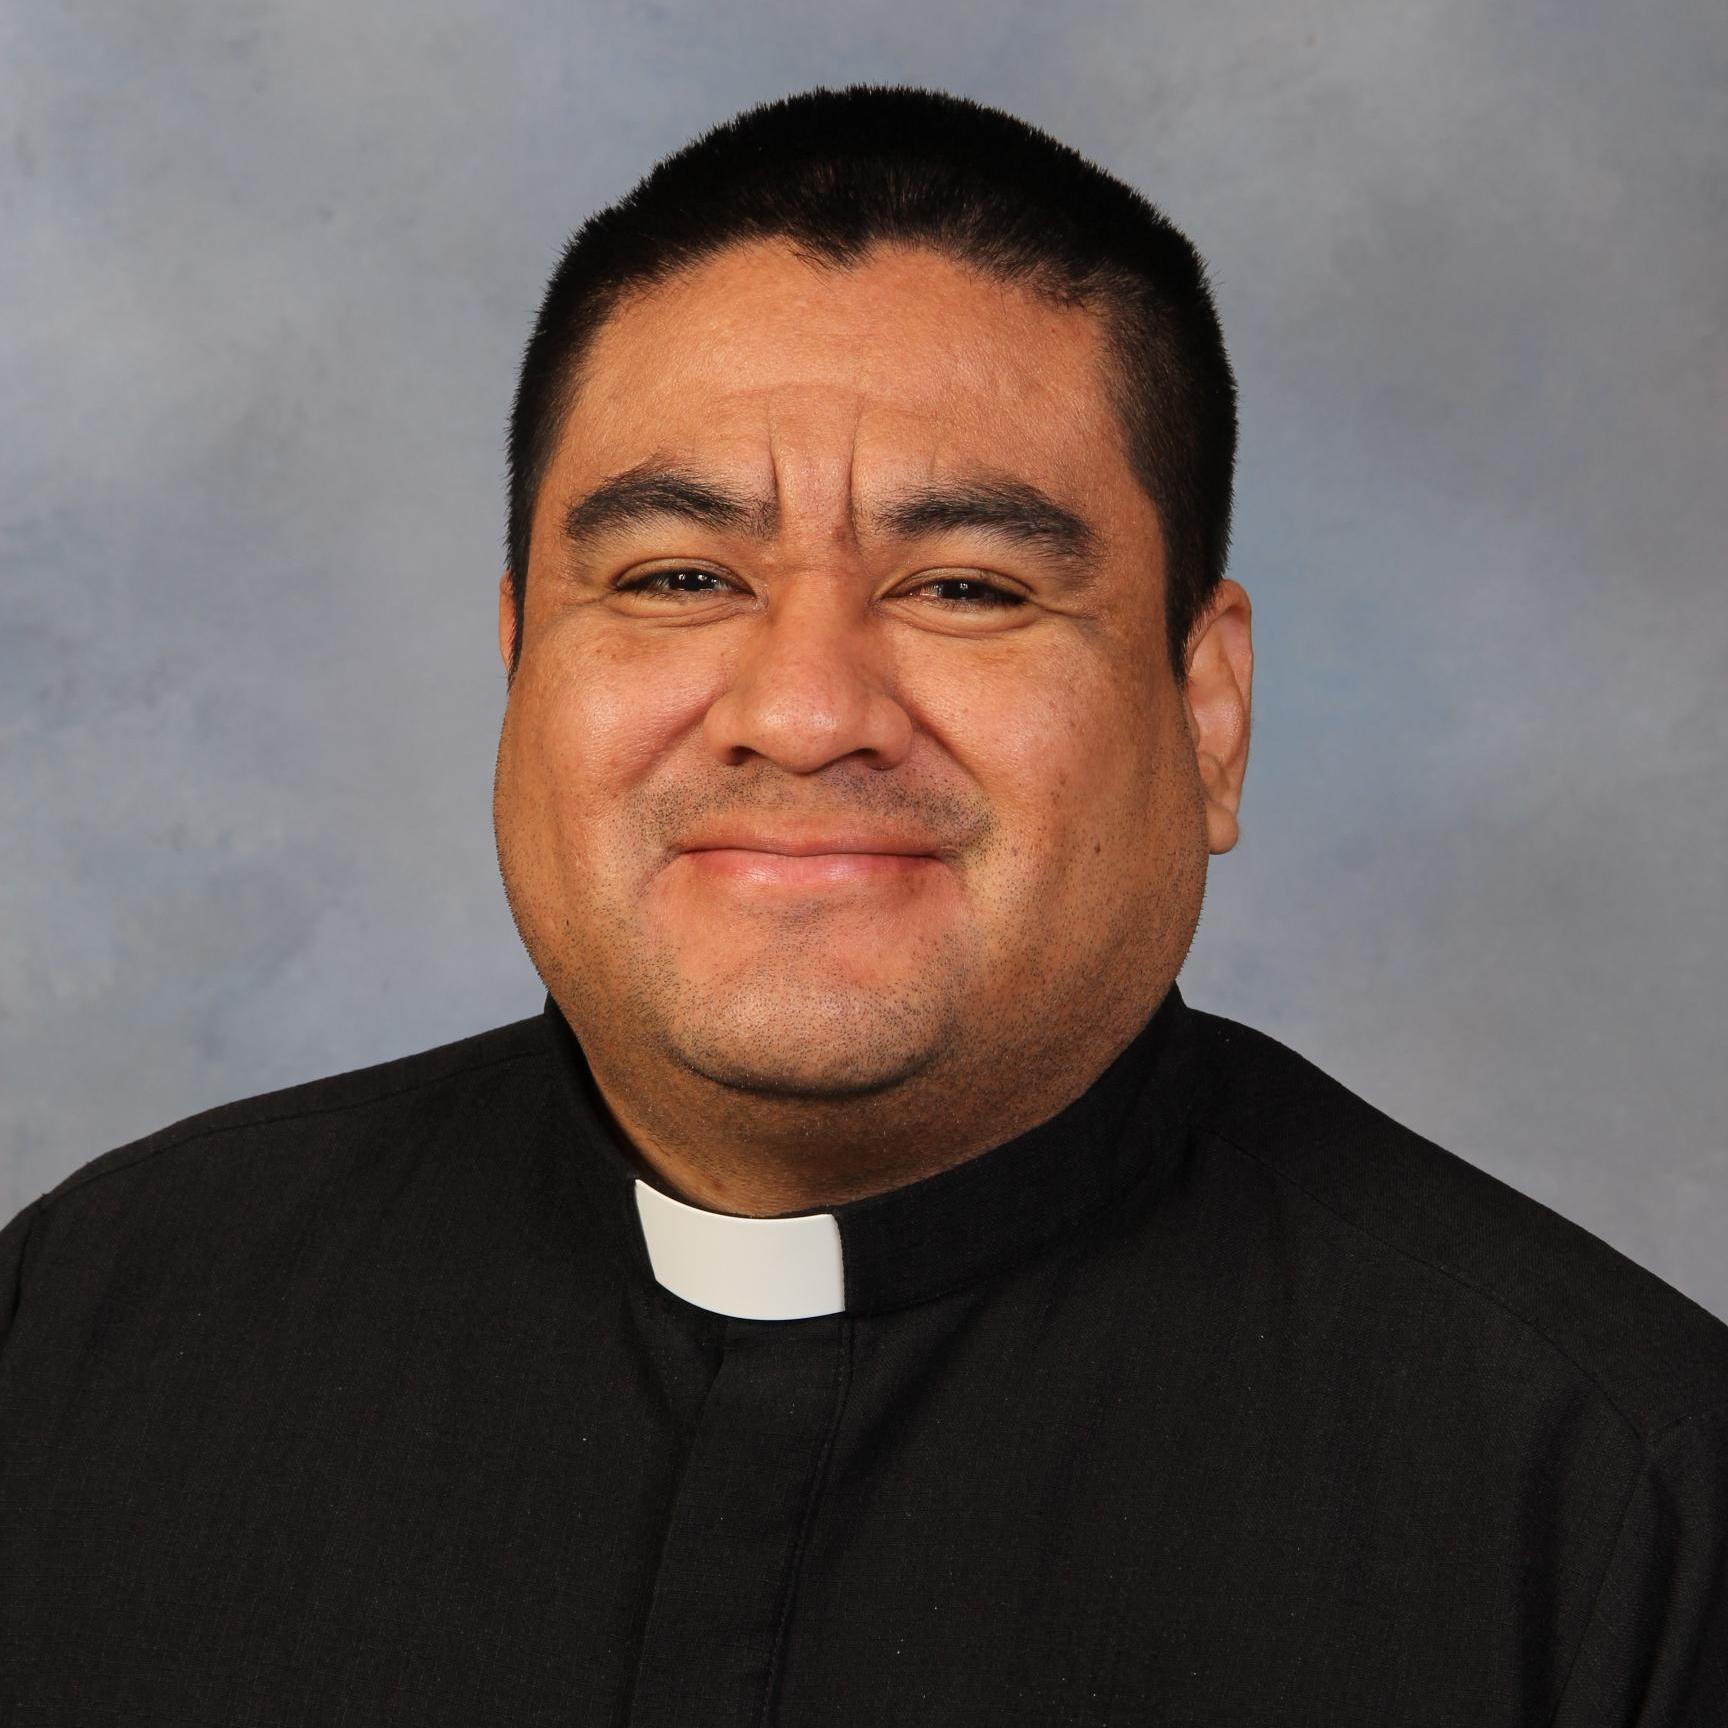 Adolfo Suarez's Profile Photo